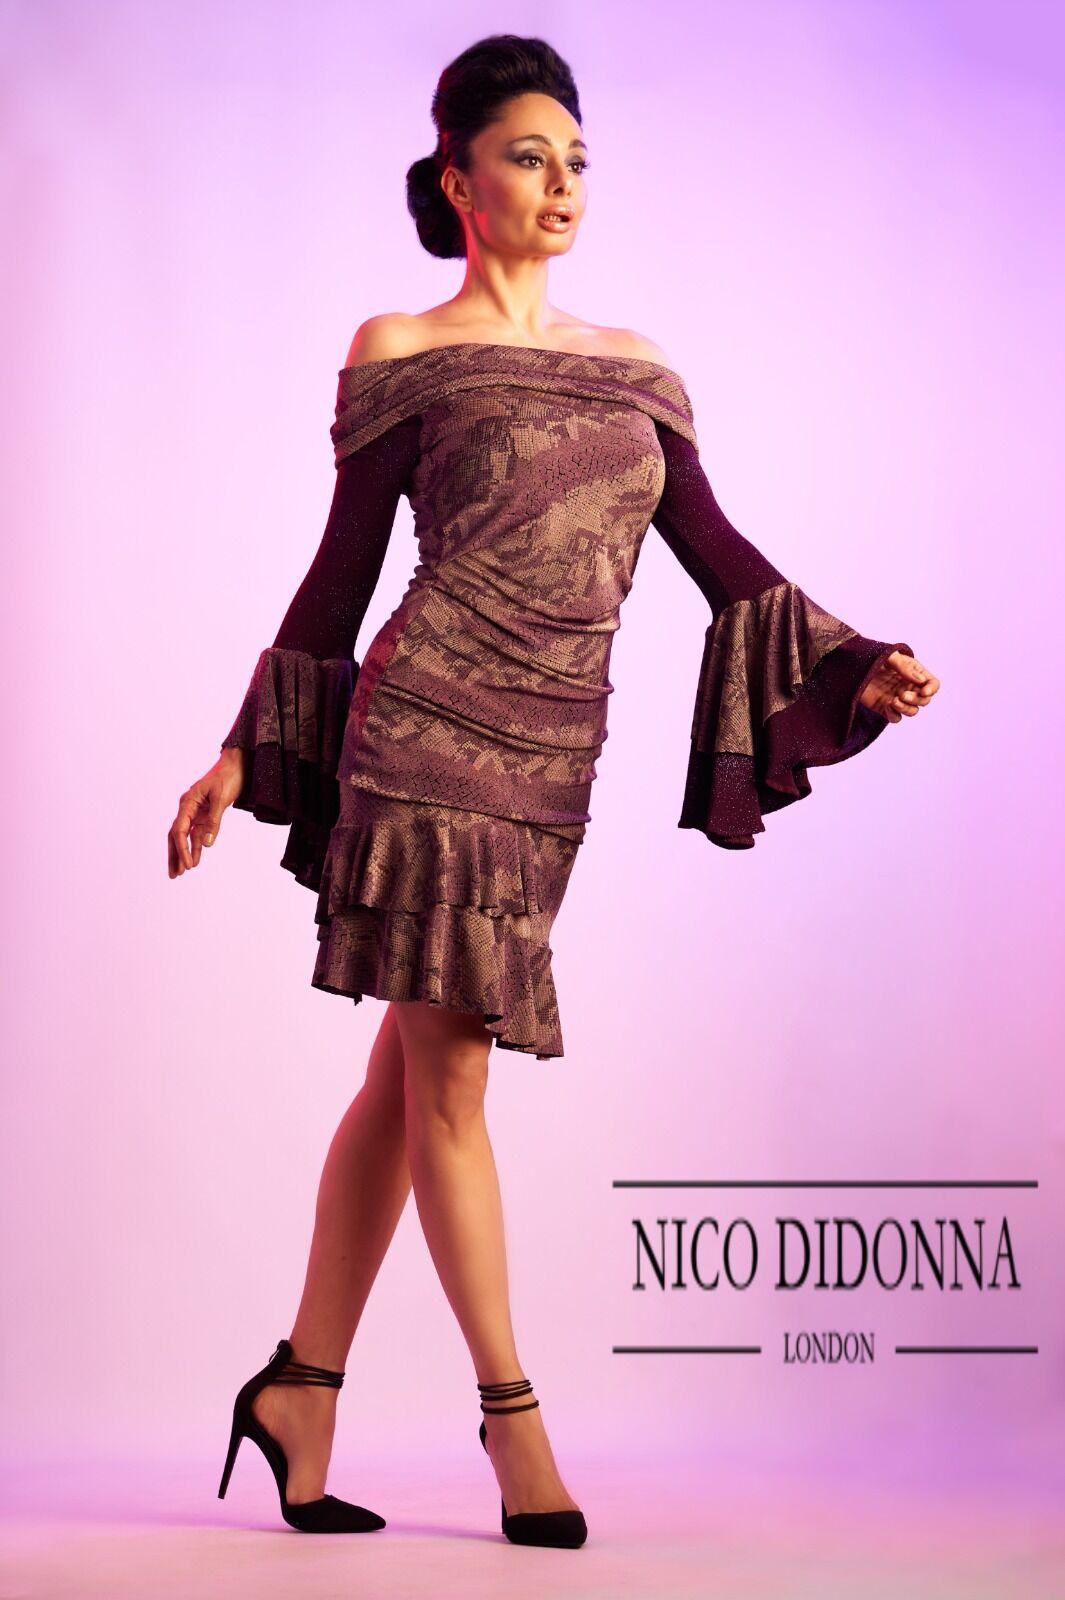 Nico DiDonna London